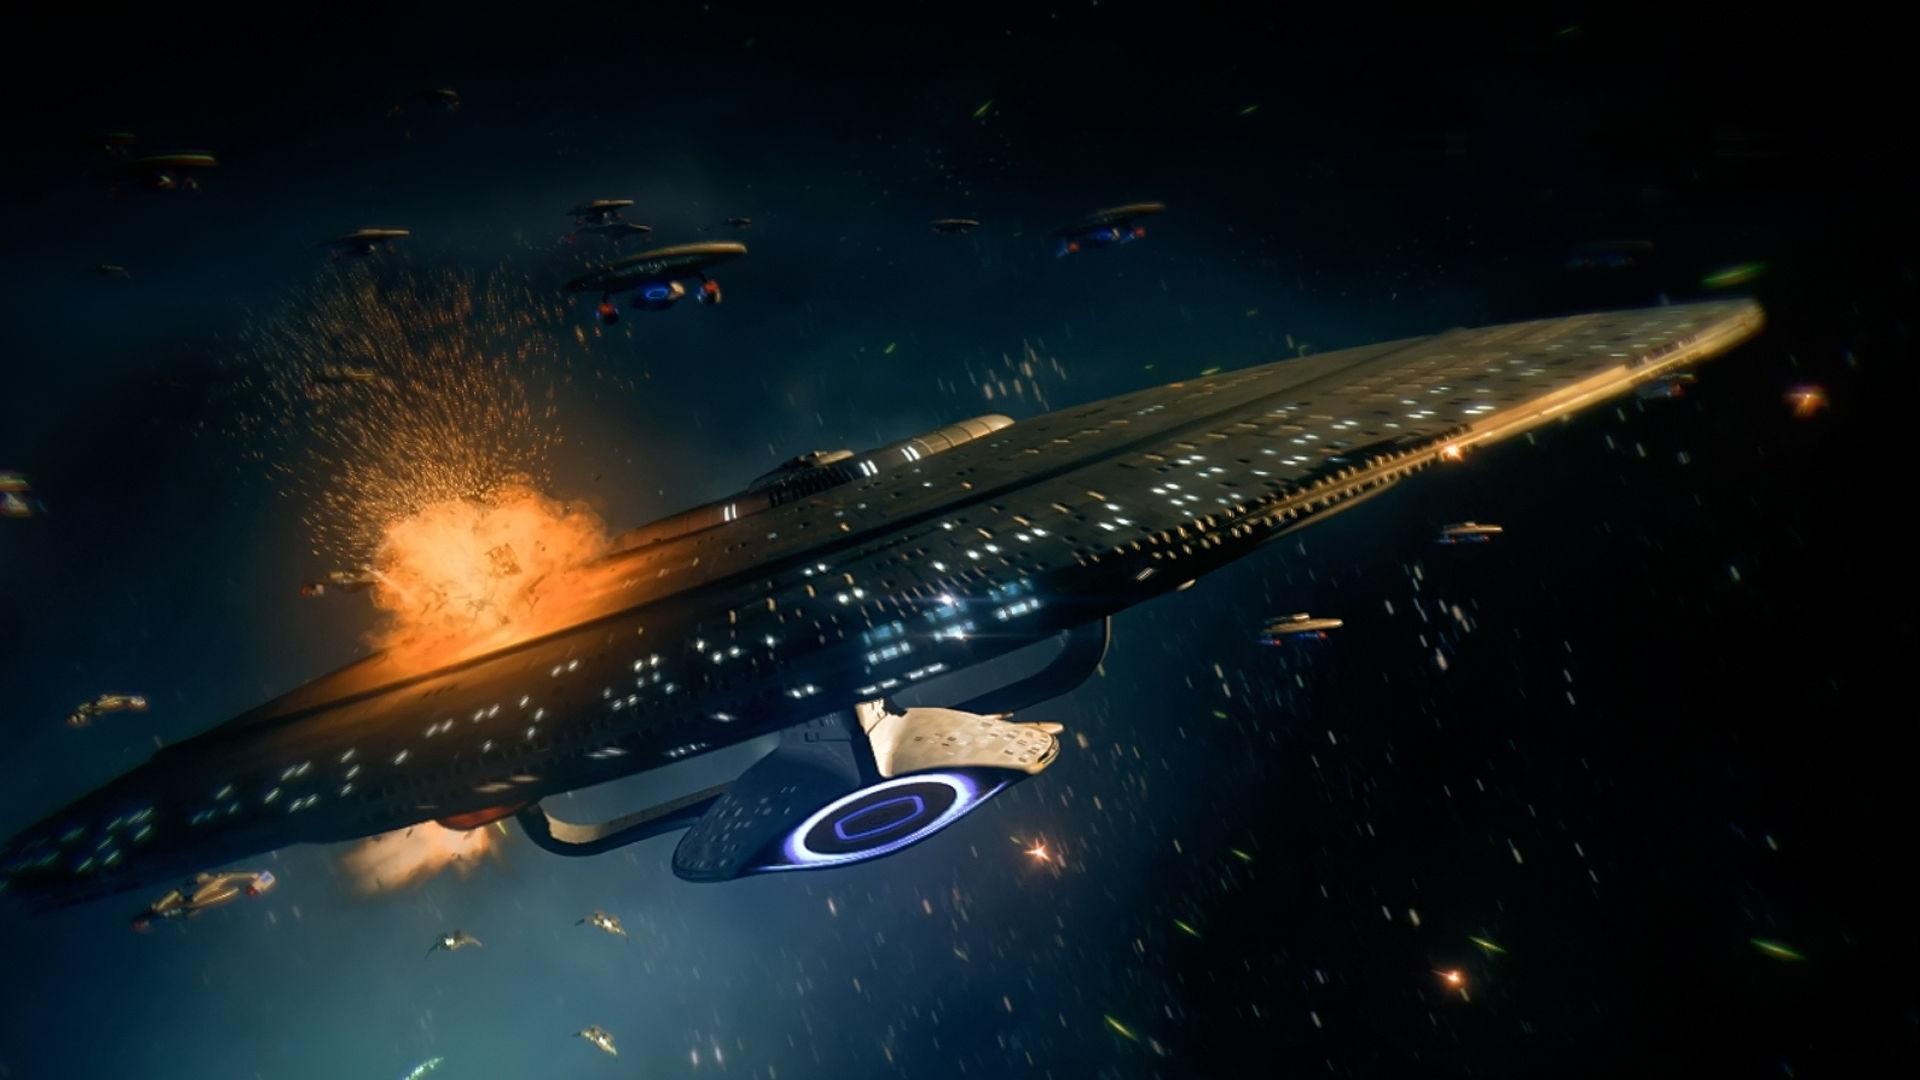 beyond-star-trek-3-where-the-franchise-should-boldly-go-next-too-many-enterprises-668004